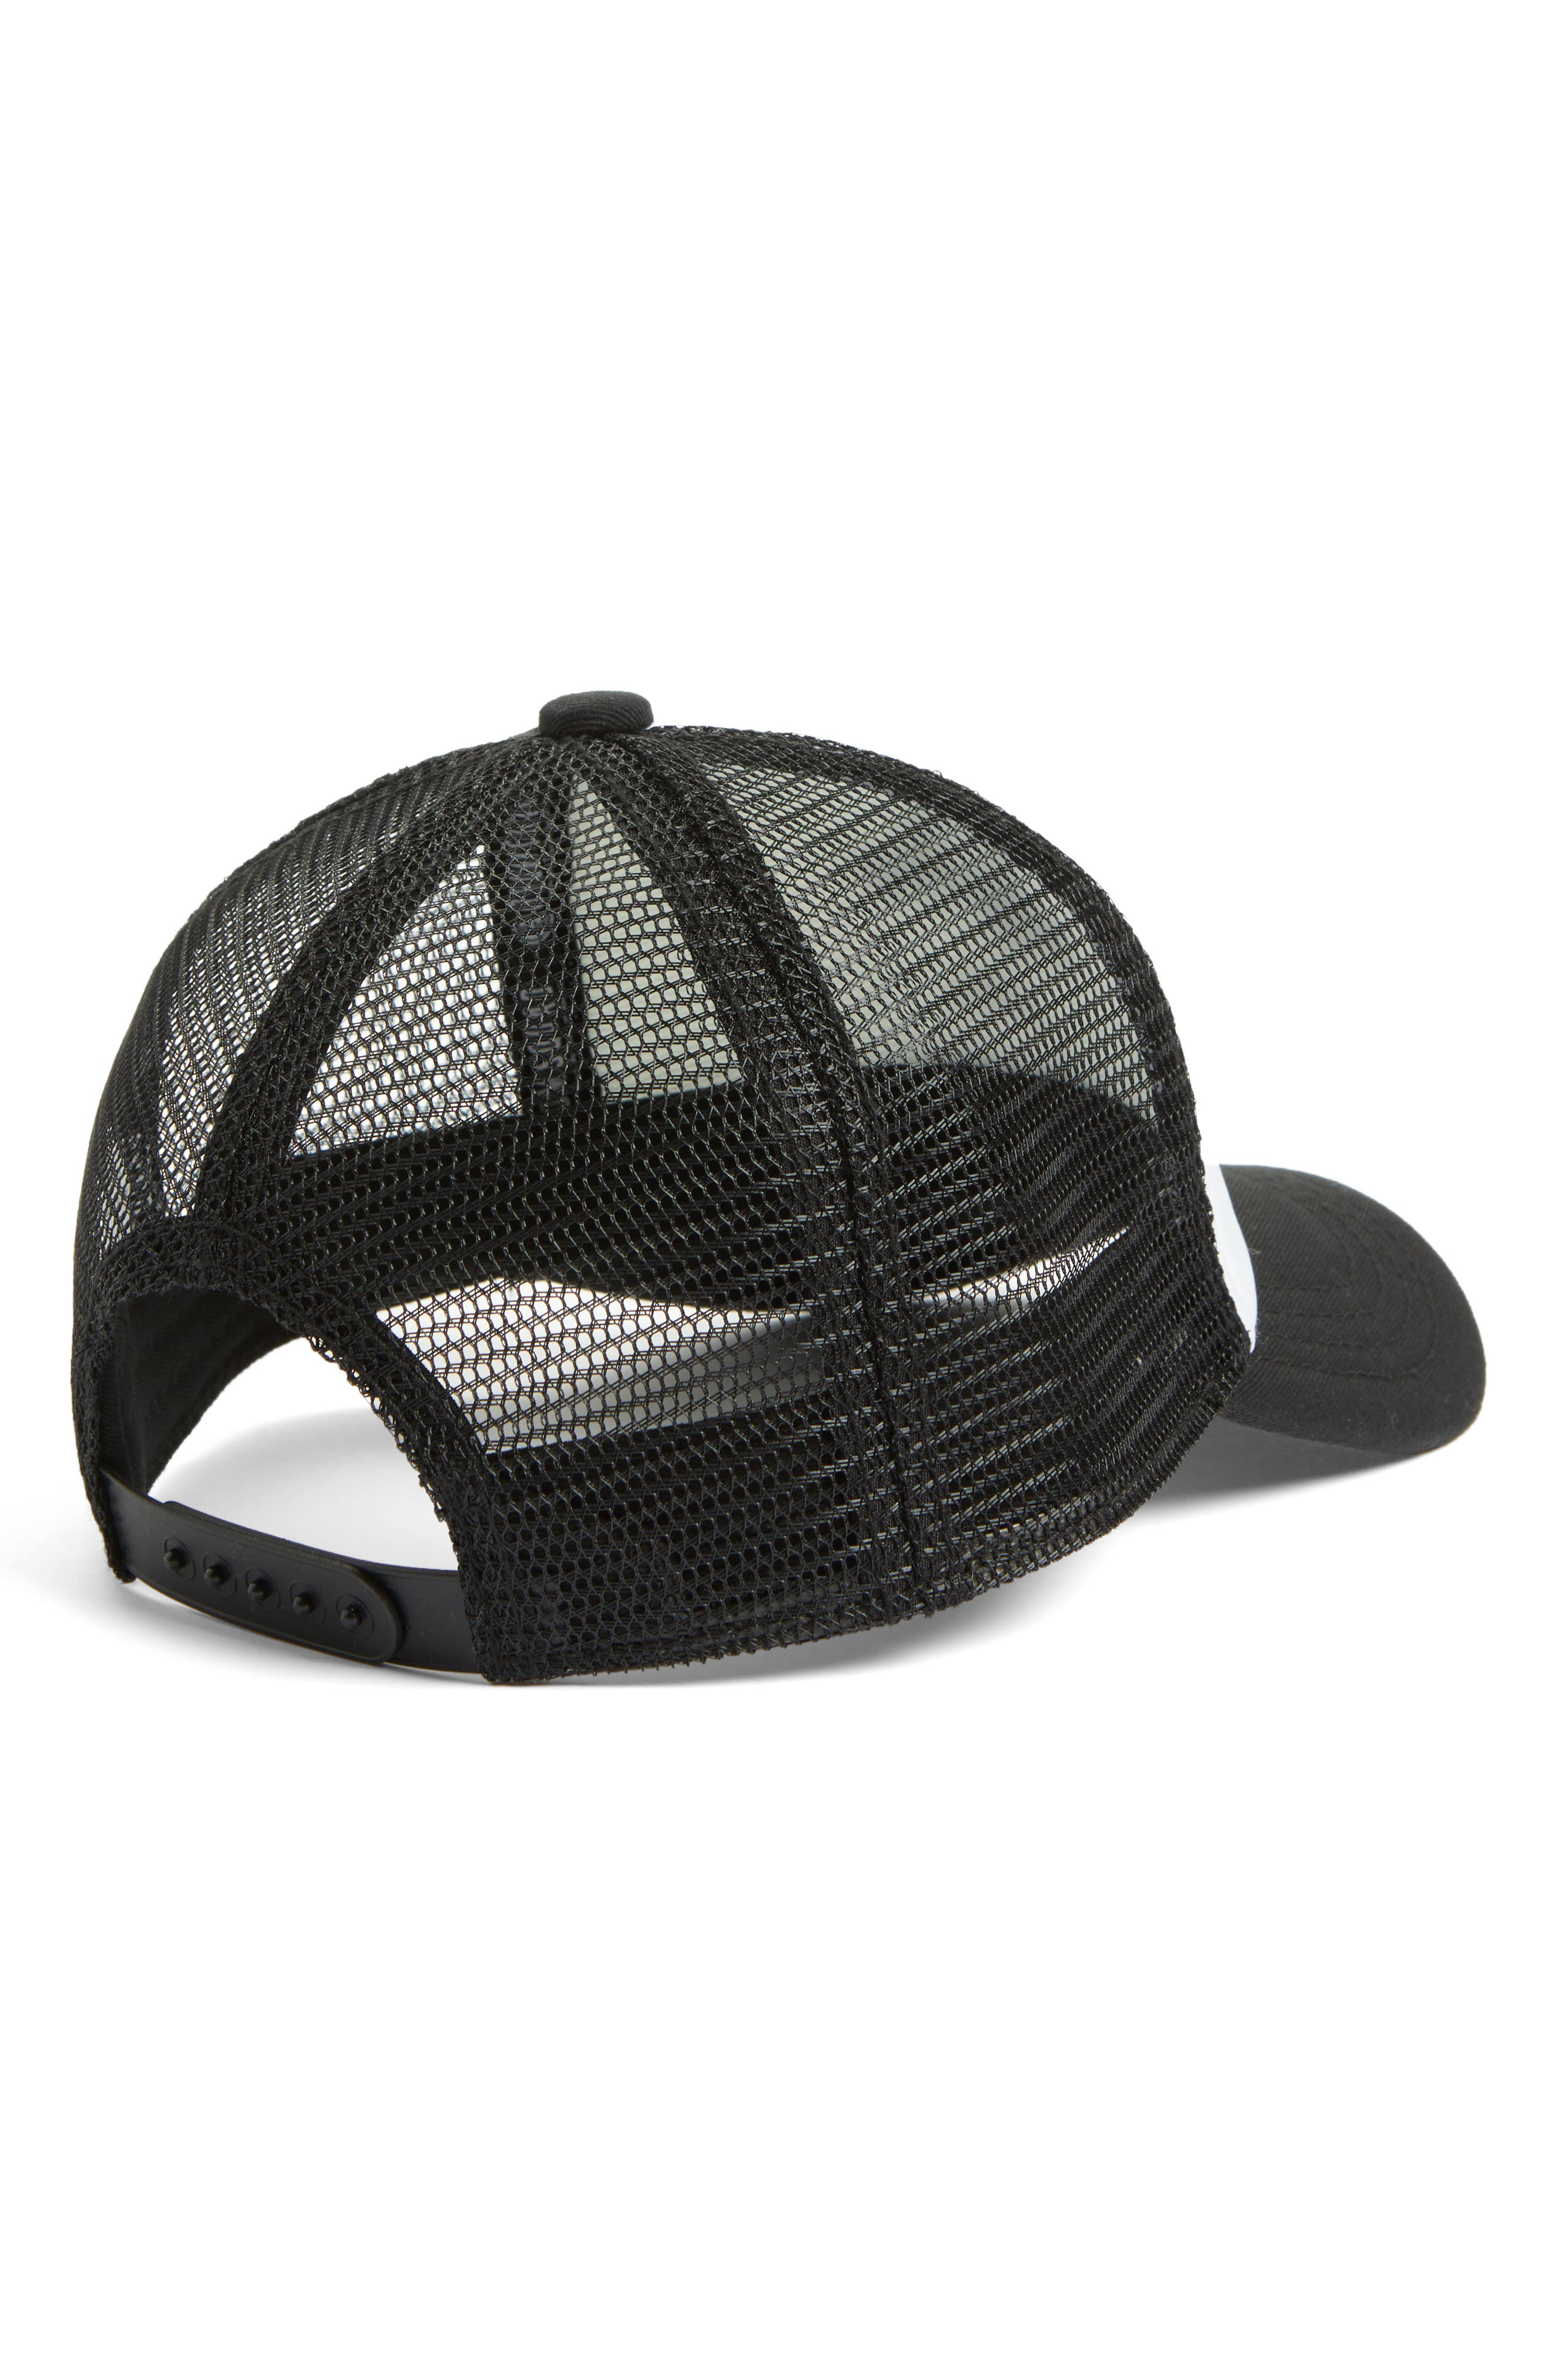 Pirate Trucker Hat,                             Alternate thumbnail 2, color,                             BLACK/ WHITE PIRATE